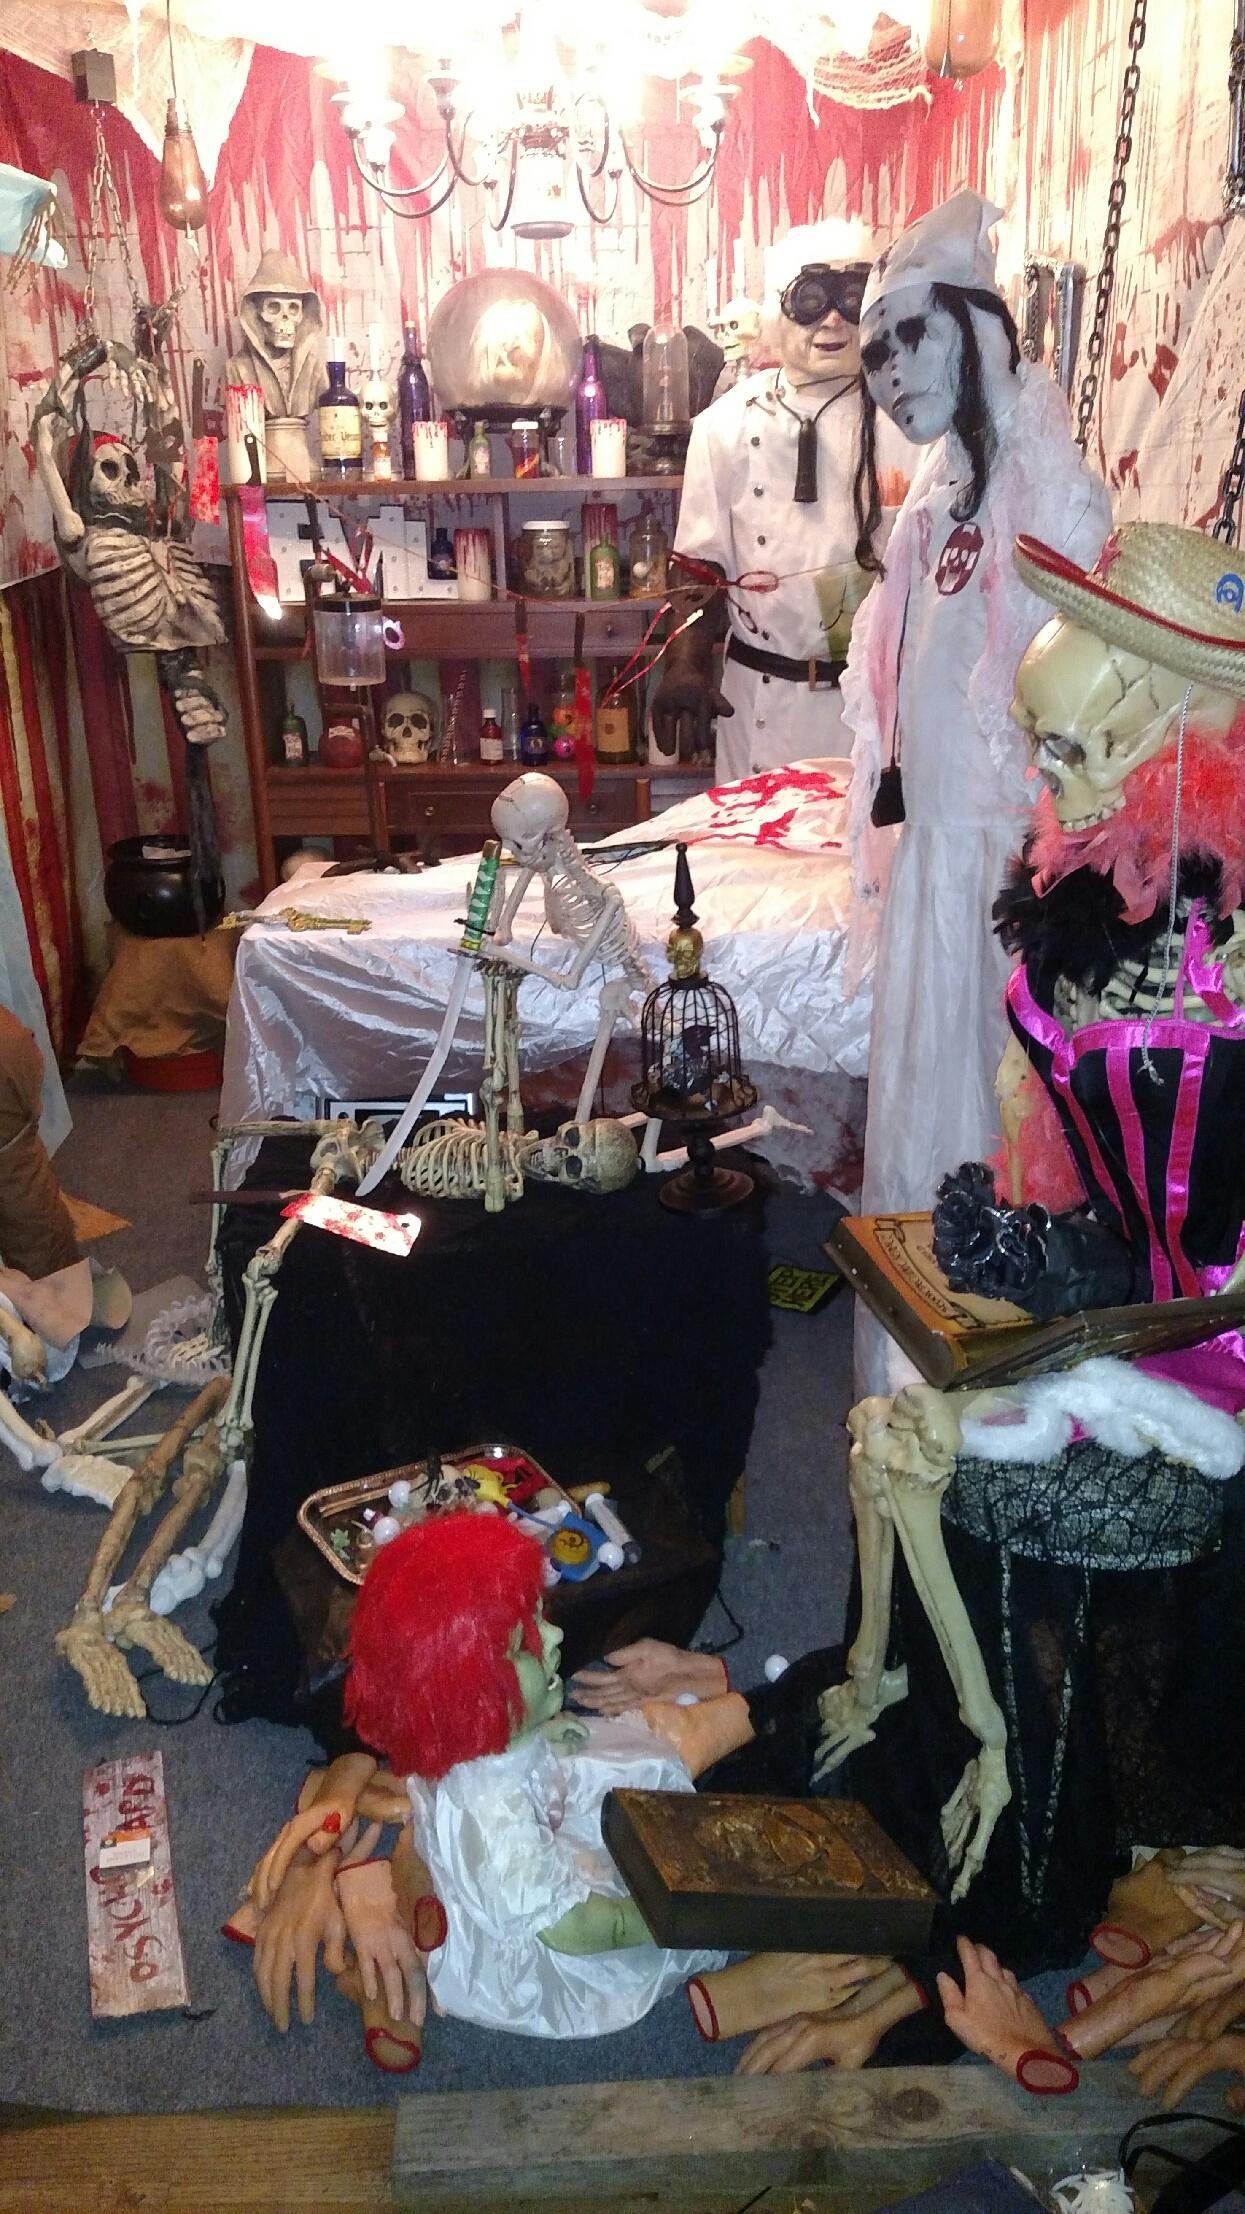 Succasunna Nj Pirate Ship House Halloween 2020 Halloween House' of Roxbury Cranks Up the Creepy | TAPinto